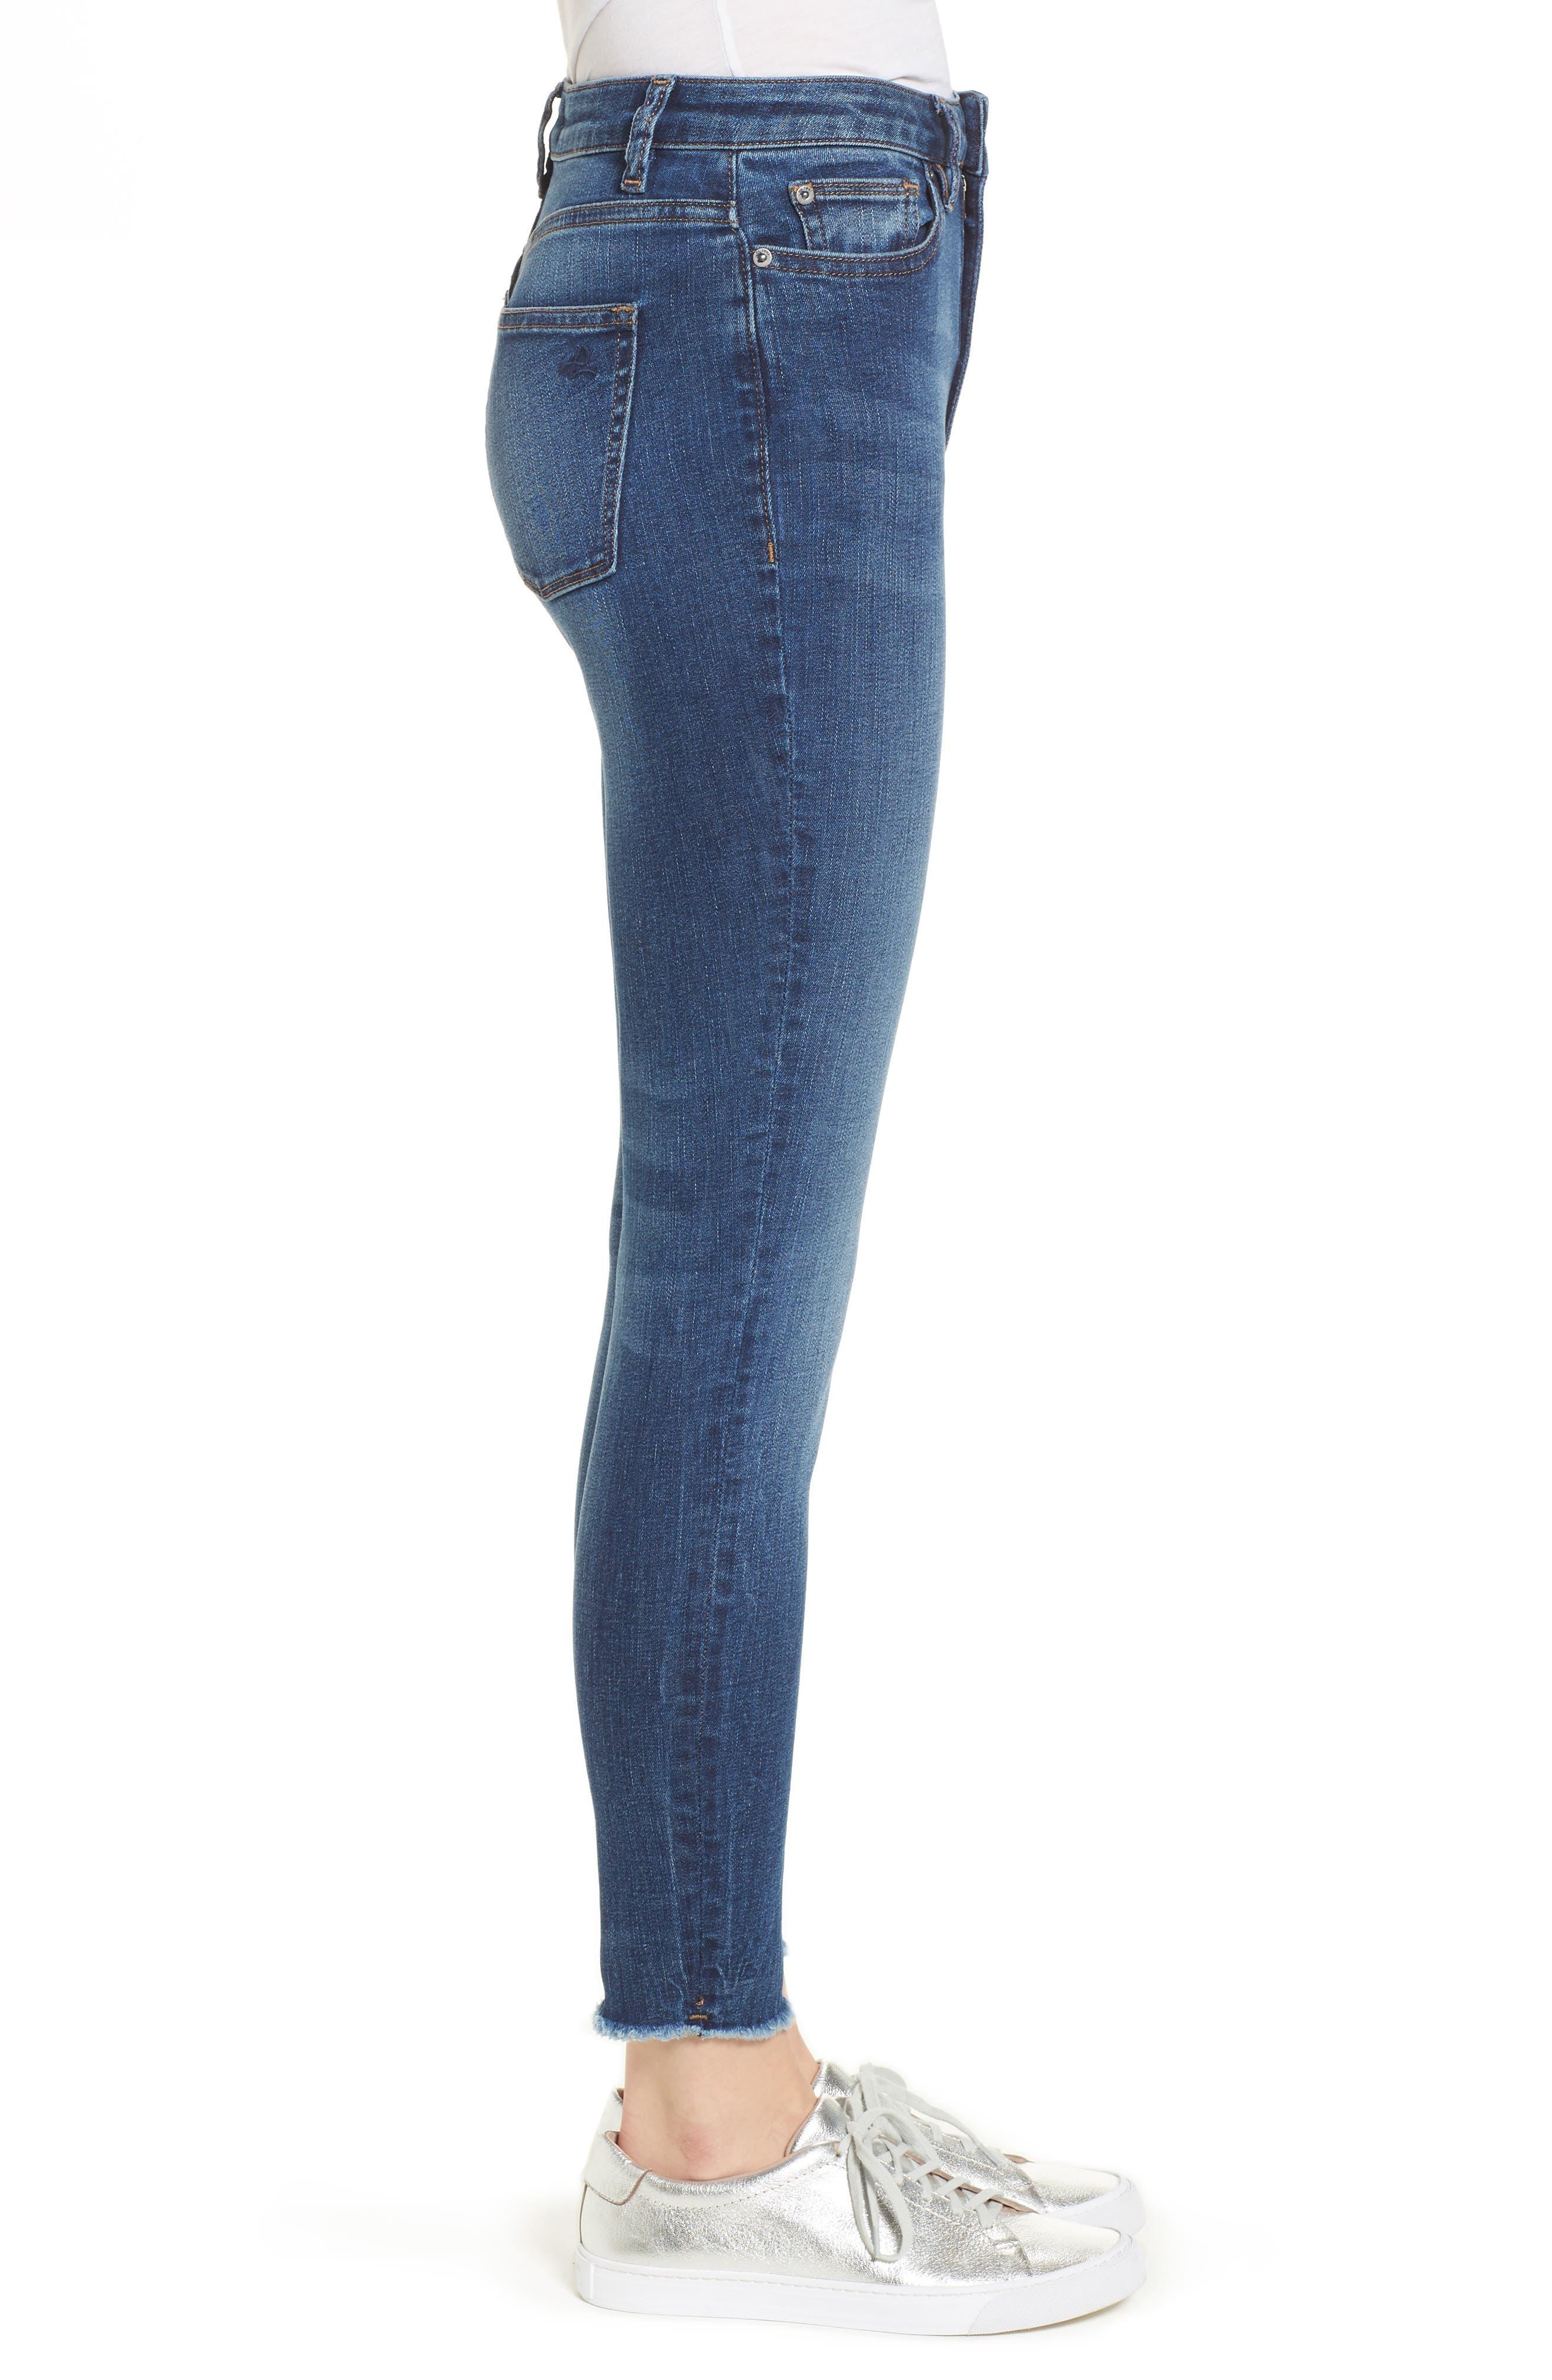 Chrissy Trimtone High Waist Skinny Jeans,                             Alternate thumbnail 3, color,                             425